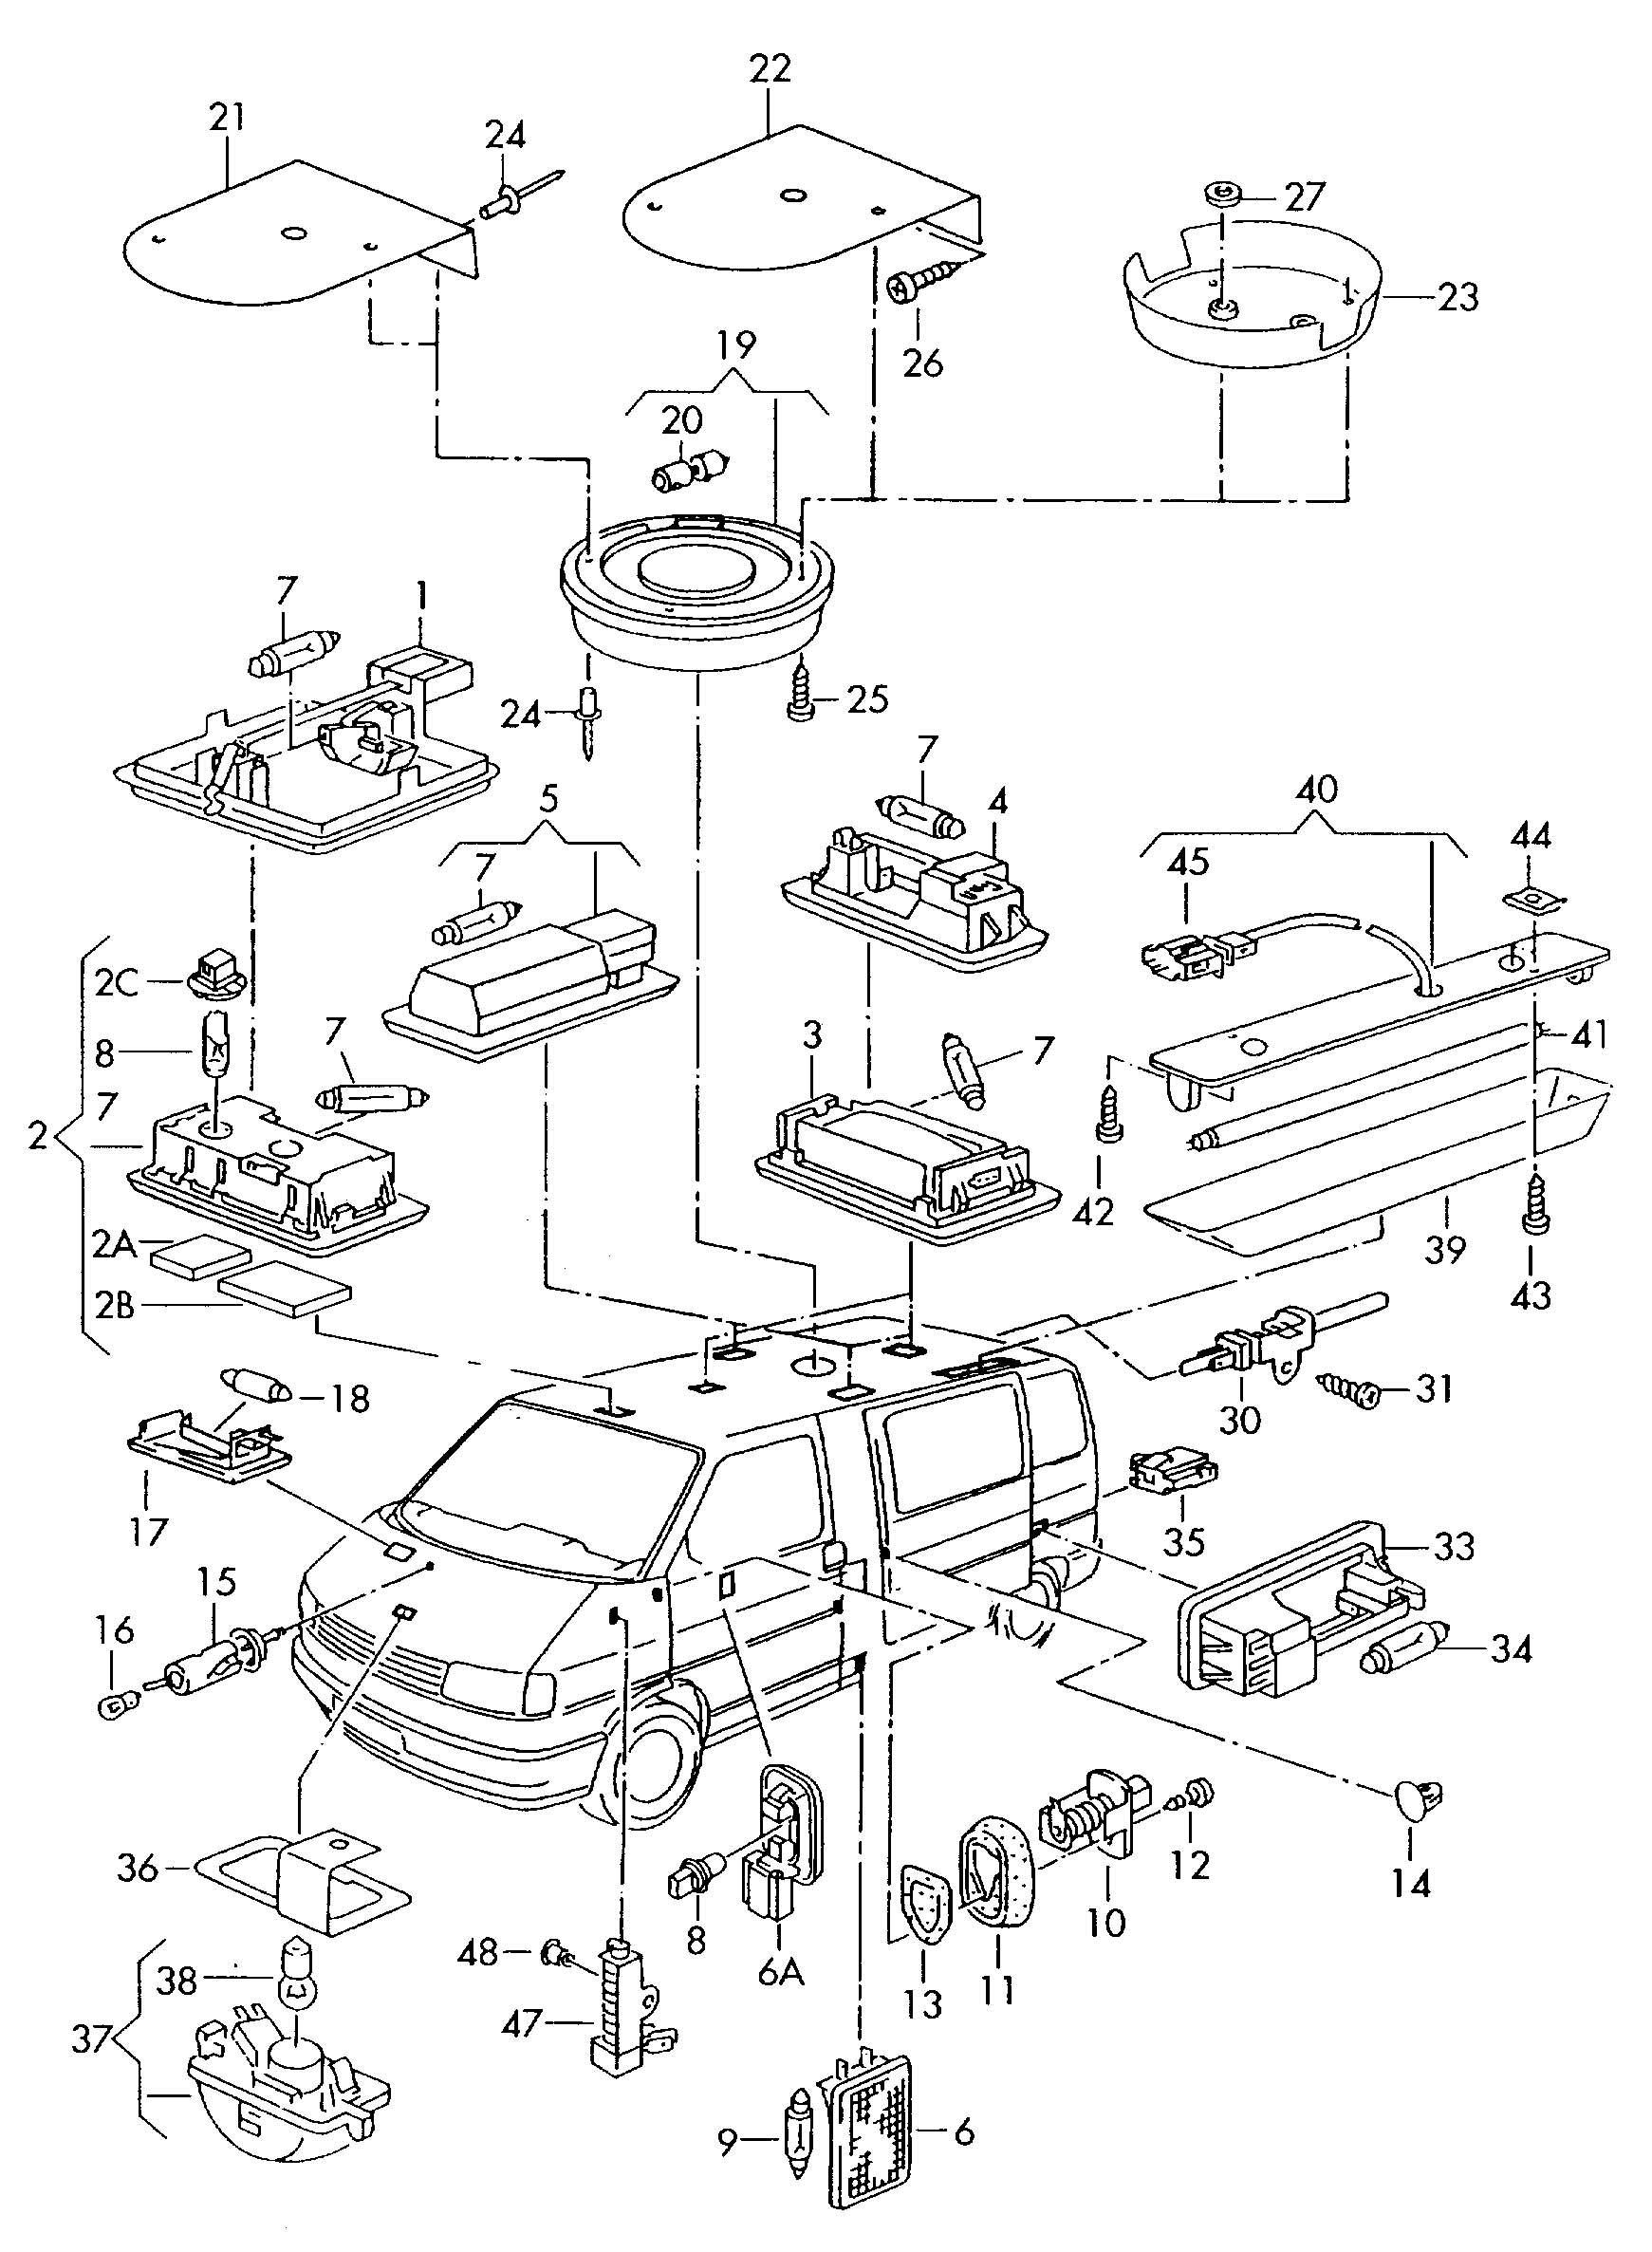 vw eos parts diagram e30 wiring volkswagen electrical imageresizertool com